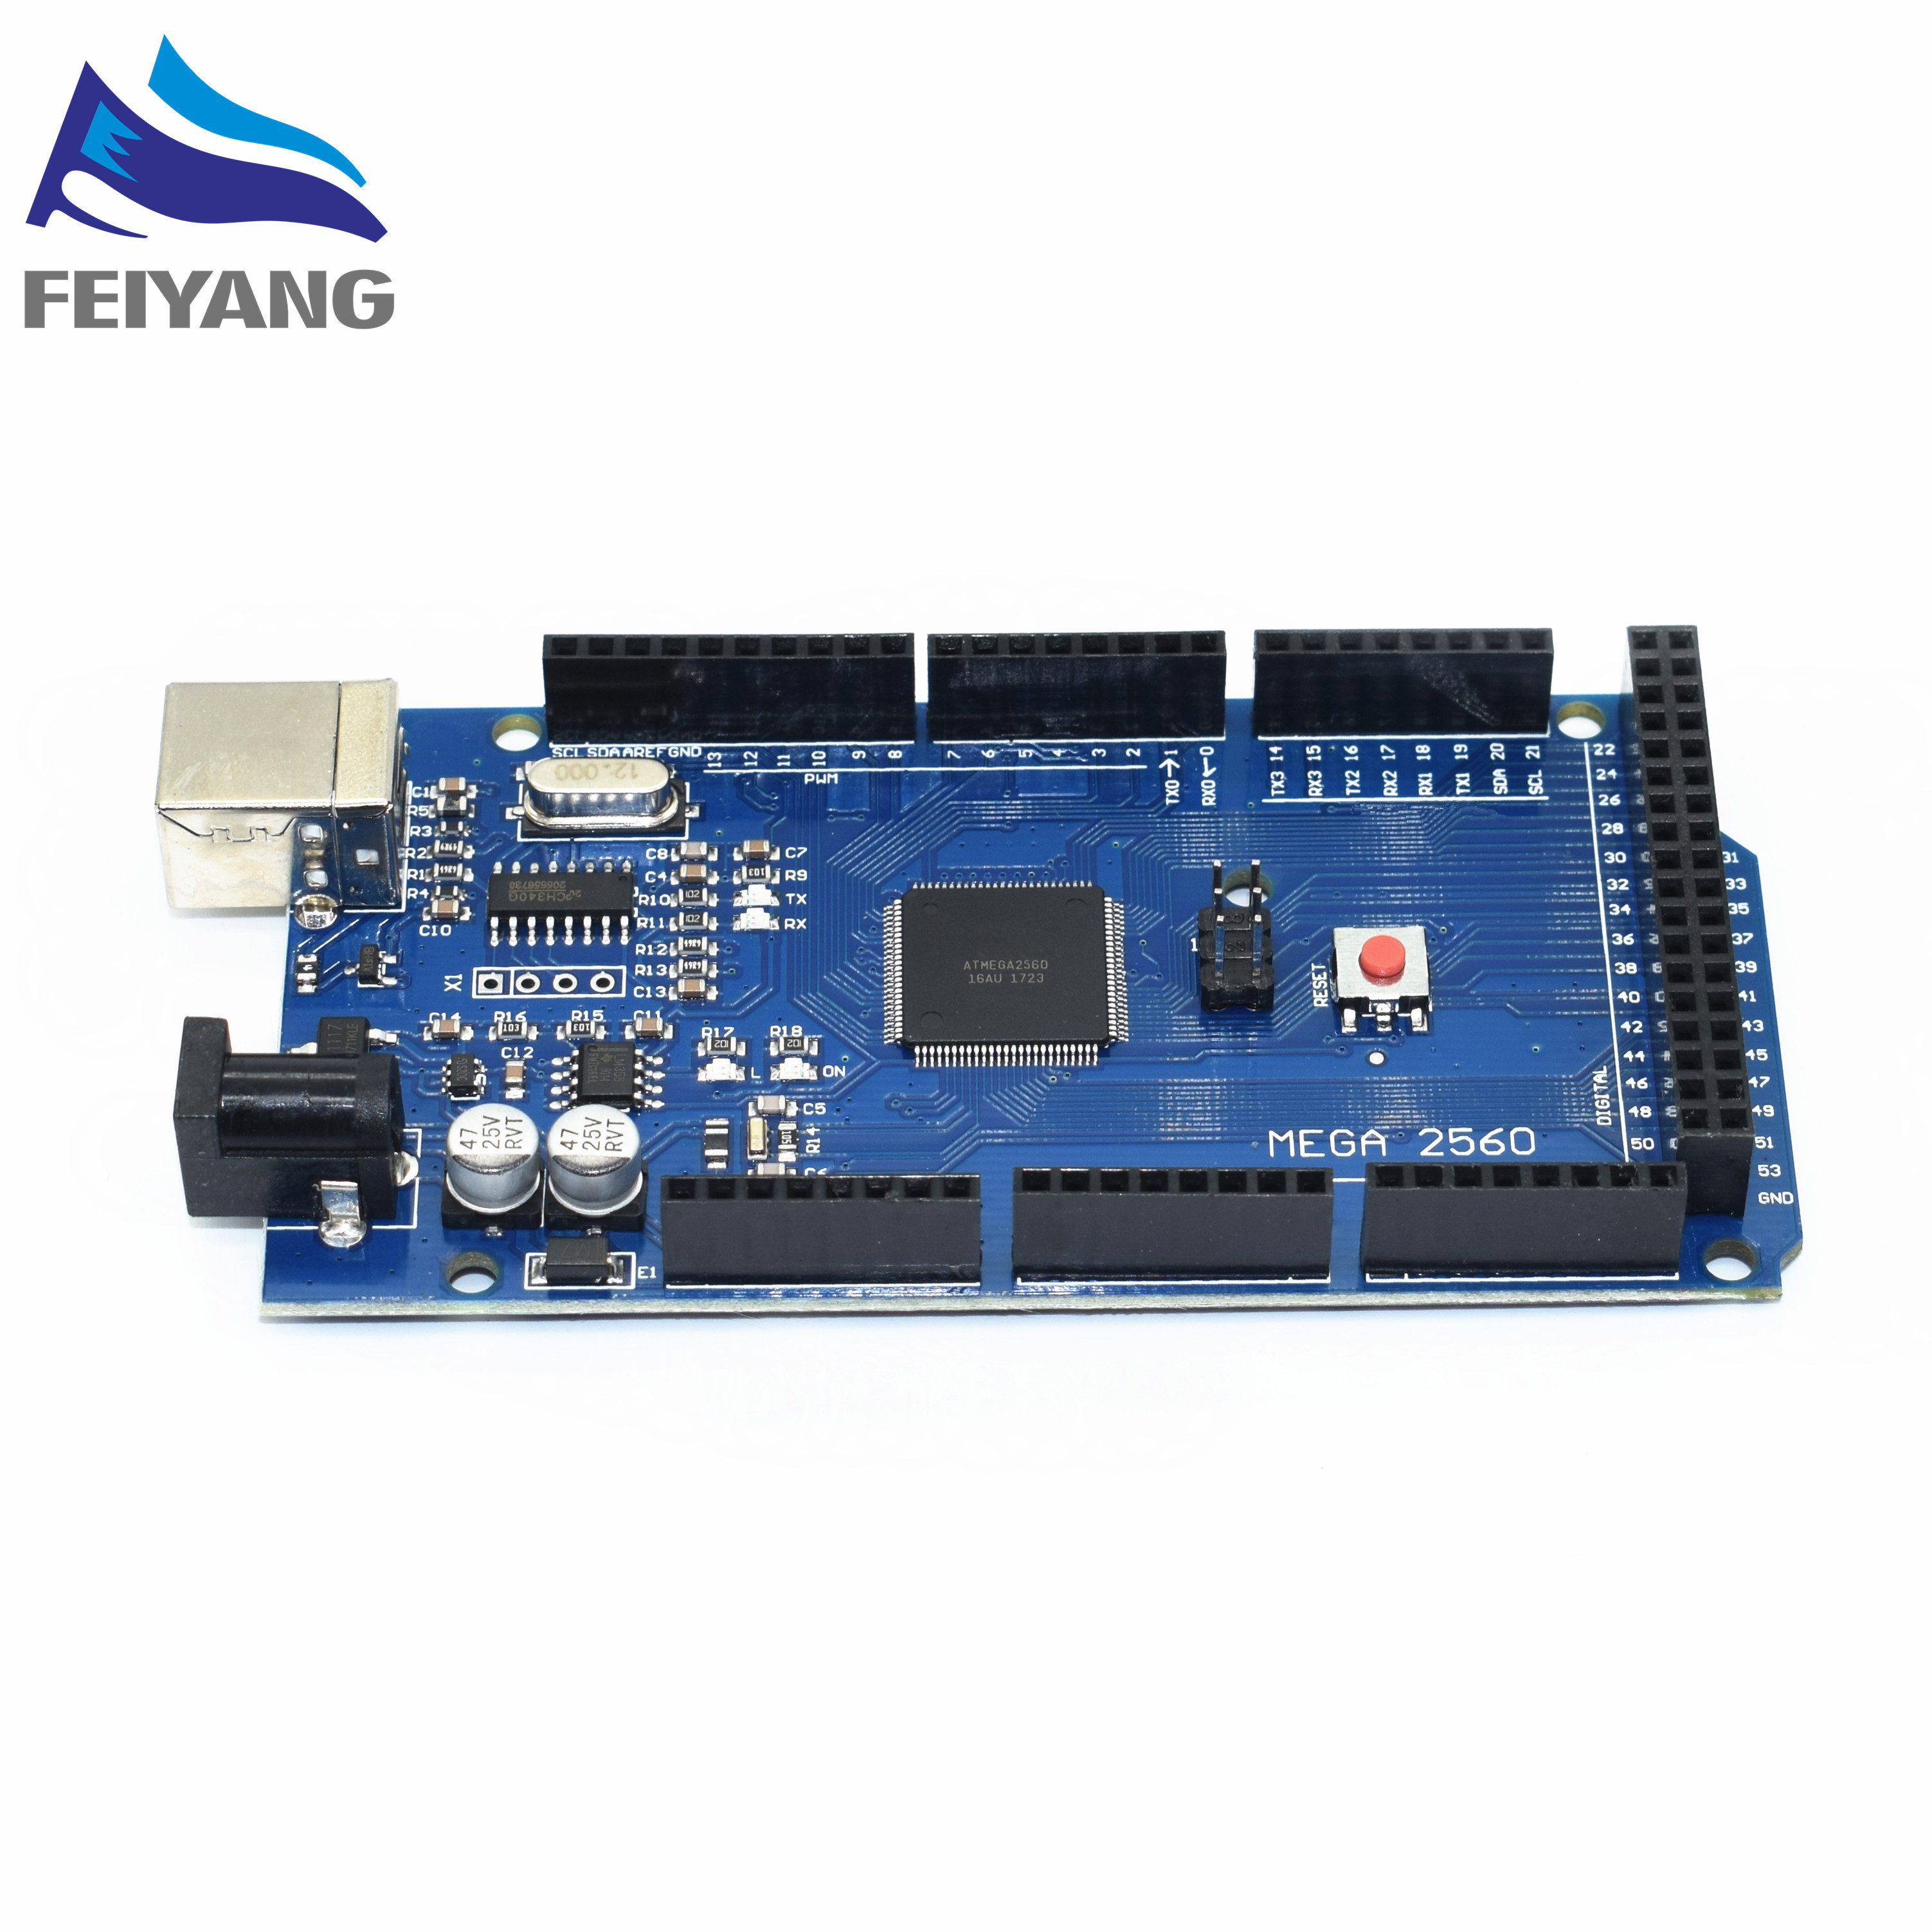 SAMIORE ROBOT MEGA2560 MEGA 2560 R3 (ATmega2560-16AU CH340G) AVR USB conseil